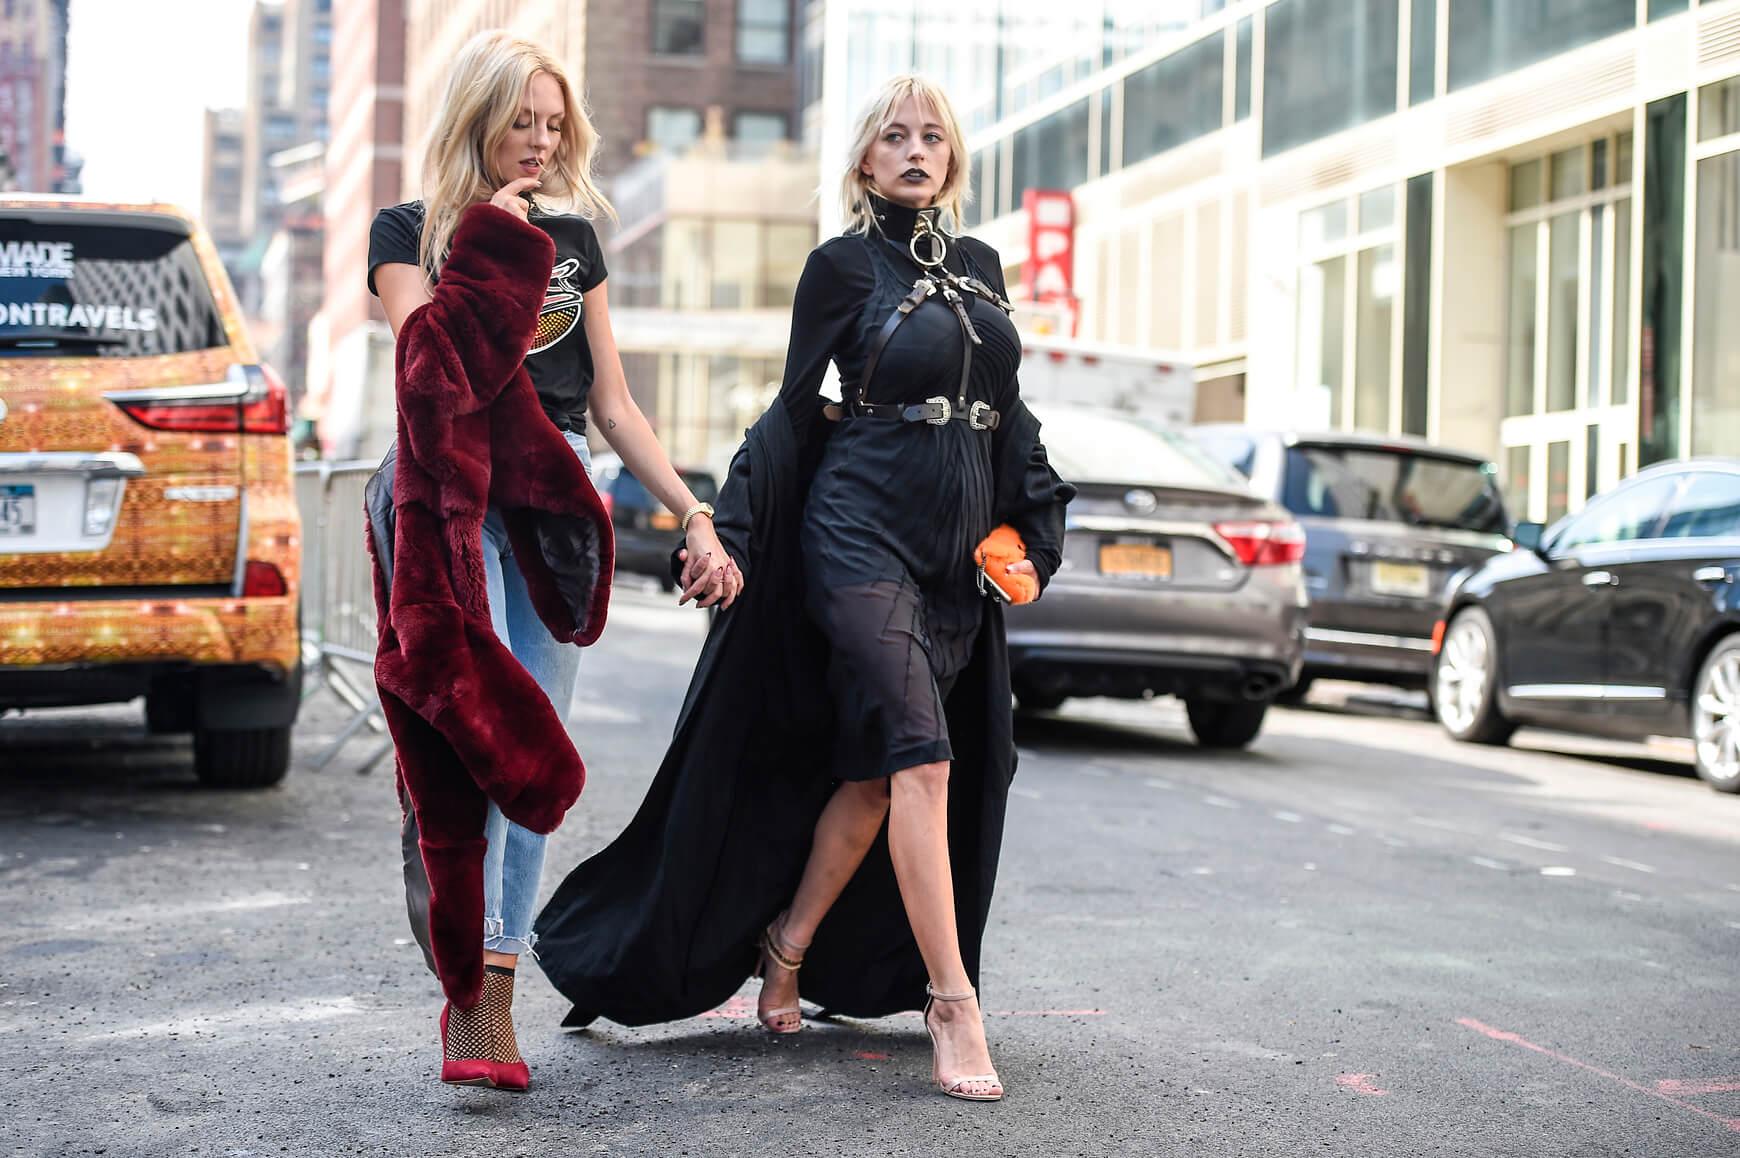 Fashion company in new york 17